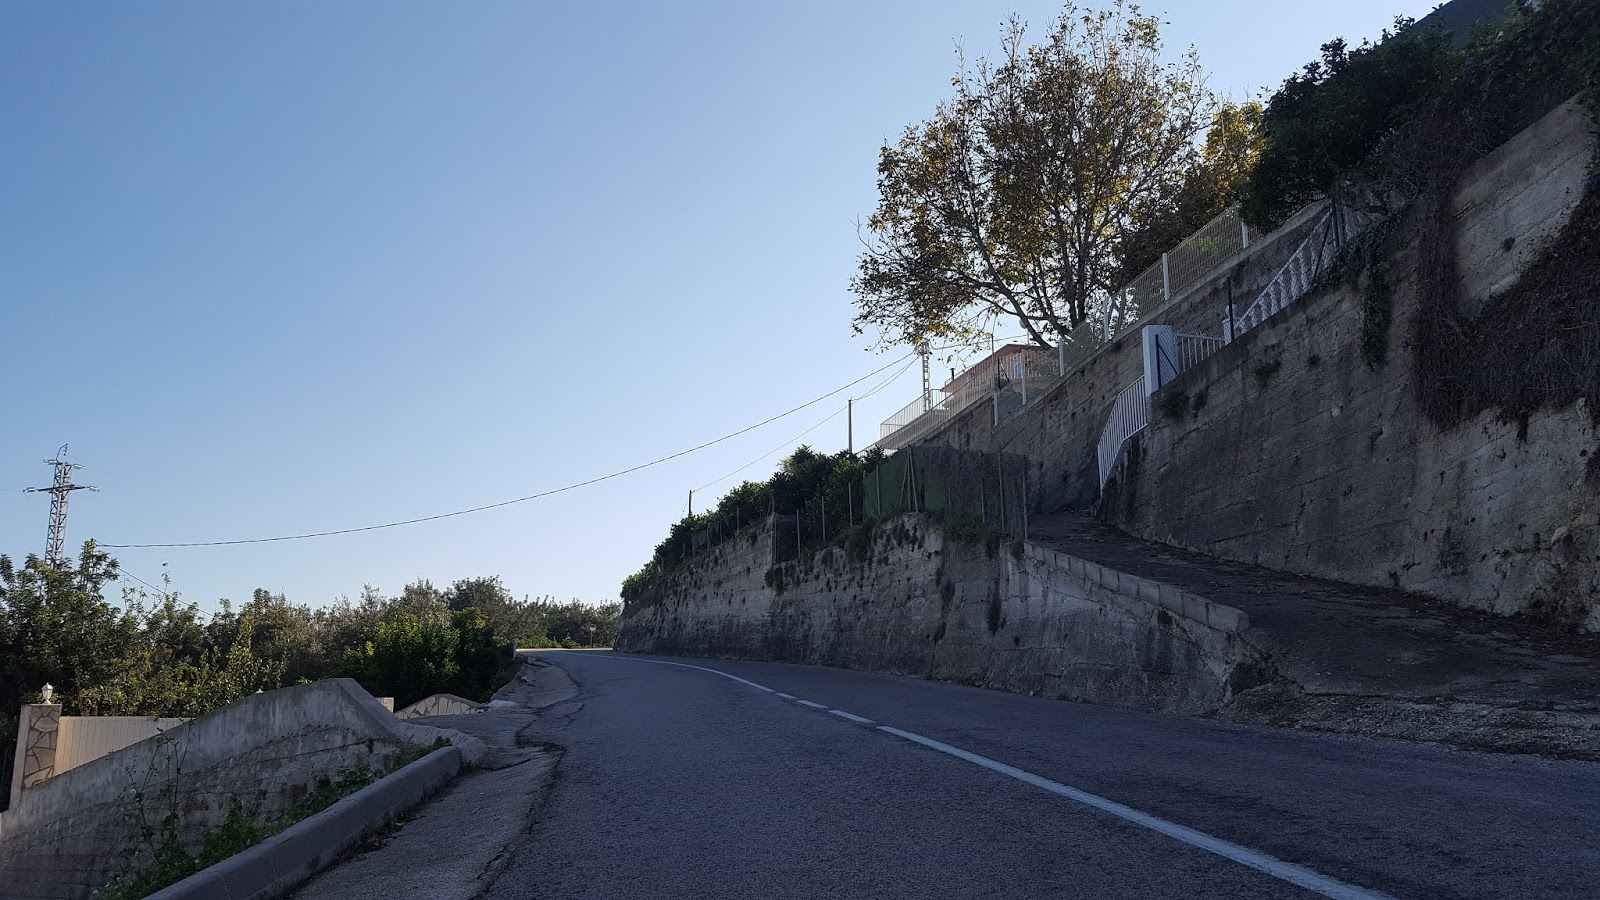 Initial slopes of the Vall de Ebo climb, Alicante, Spain